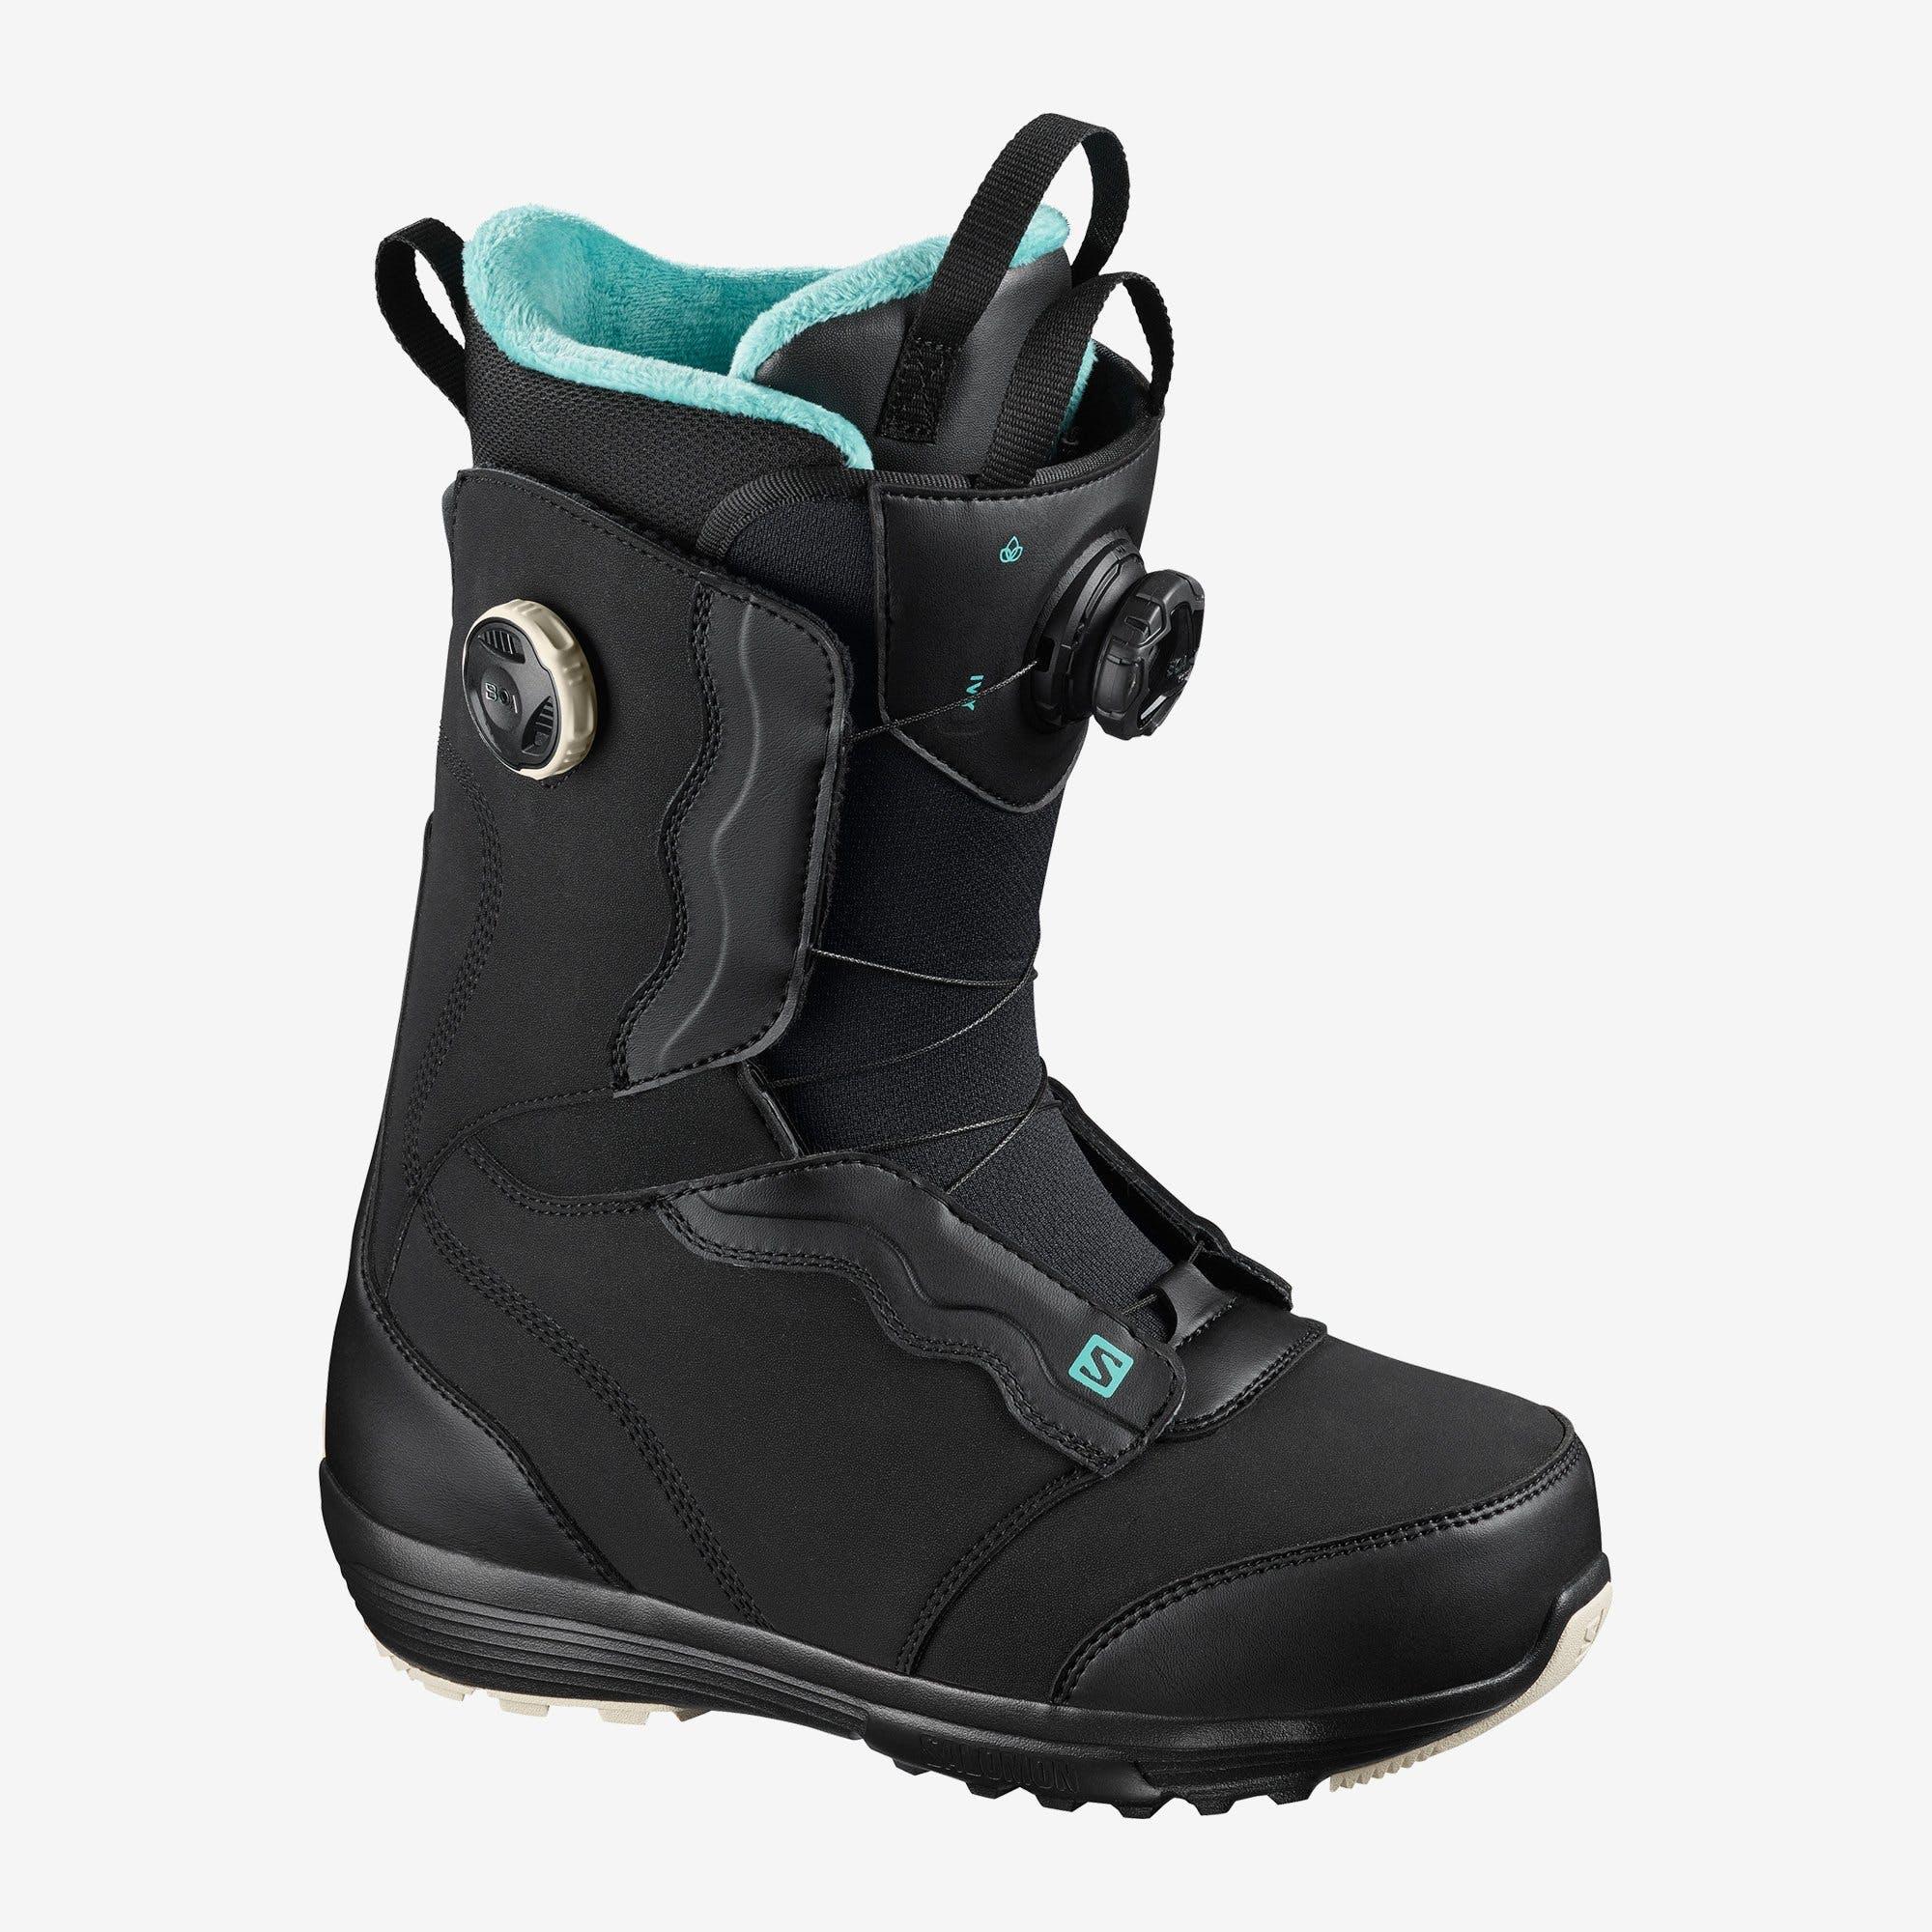 Salomon Ivy BOA Snowboard Boots · 2021